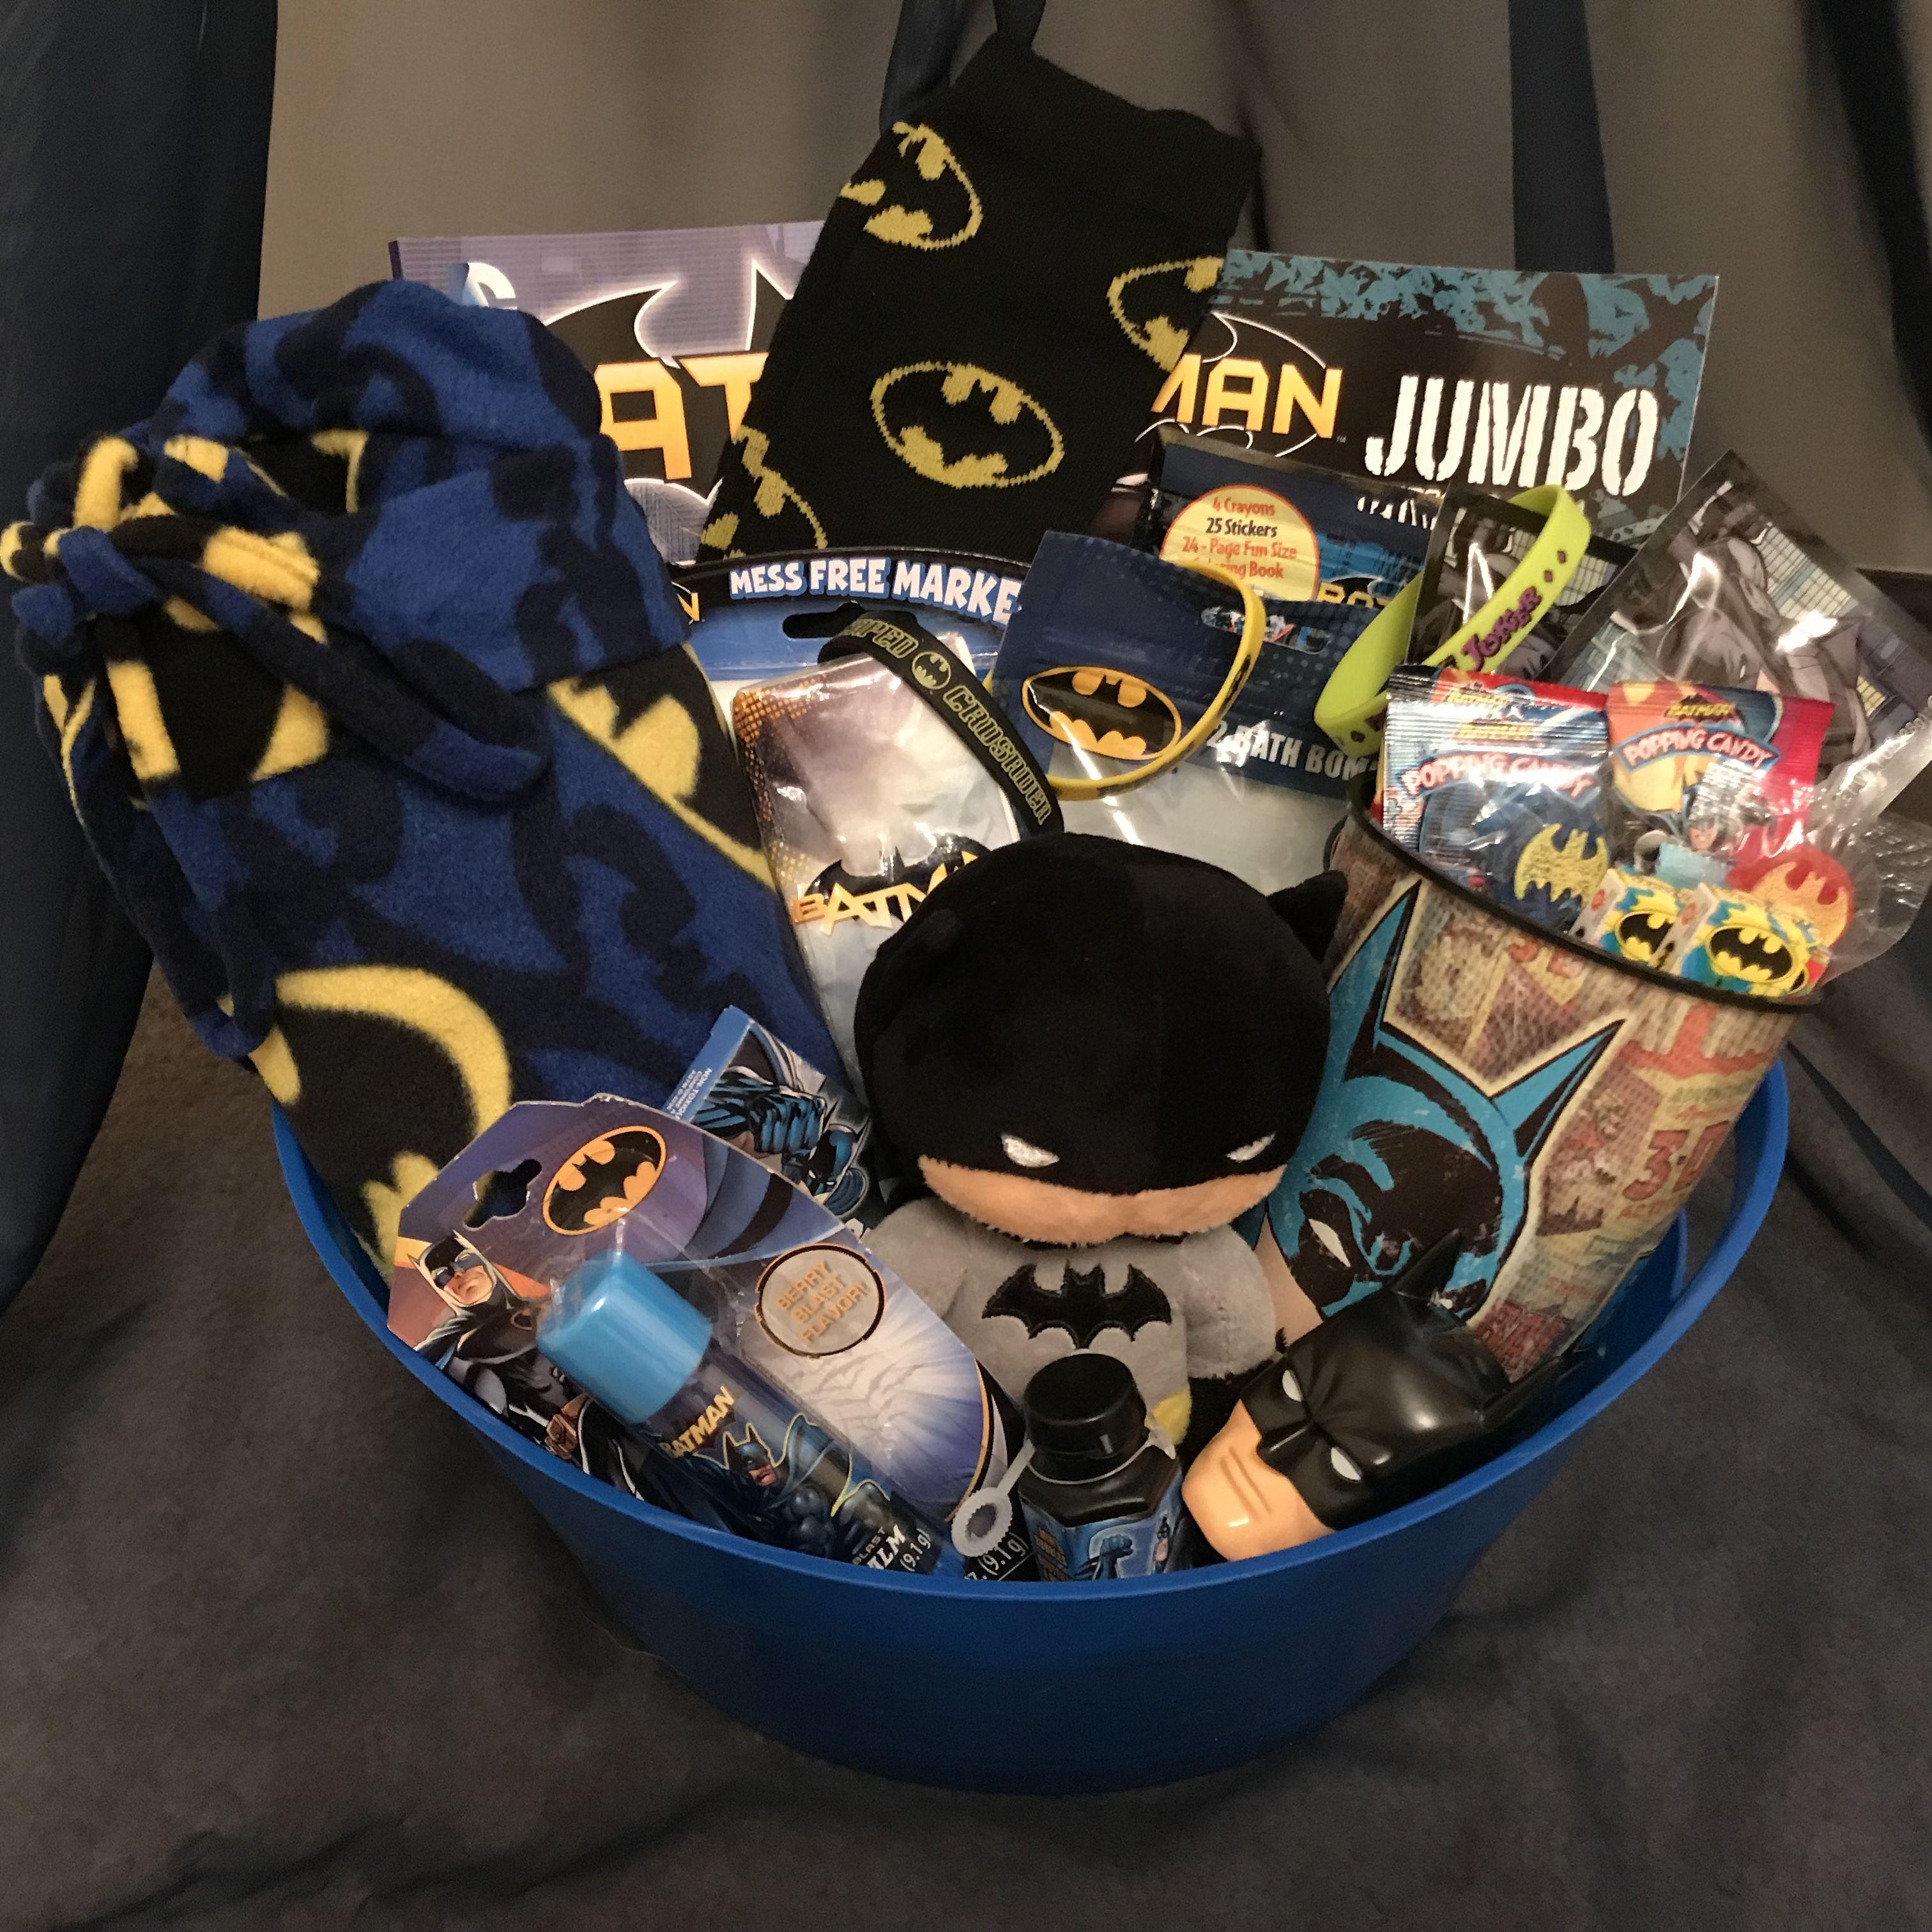 Batman Gift Basket | Batman gifts, Kids gift baskets, Themed gift ...